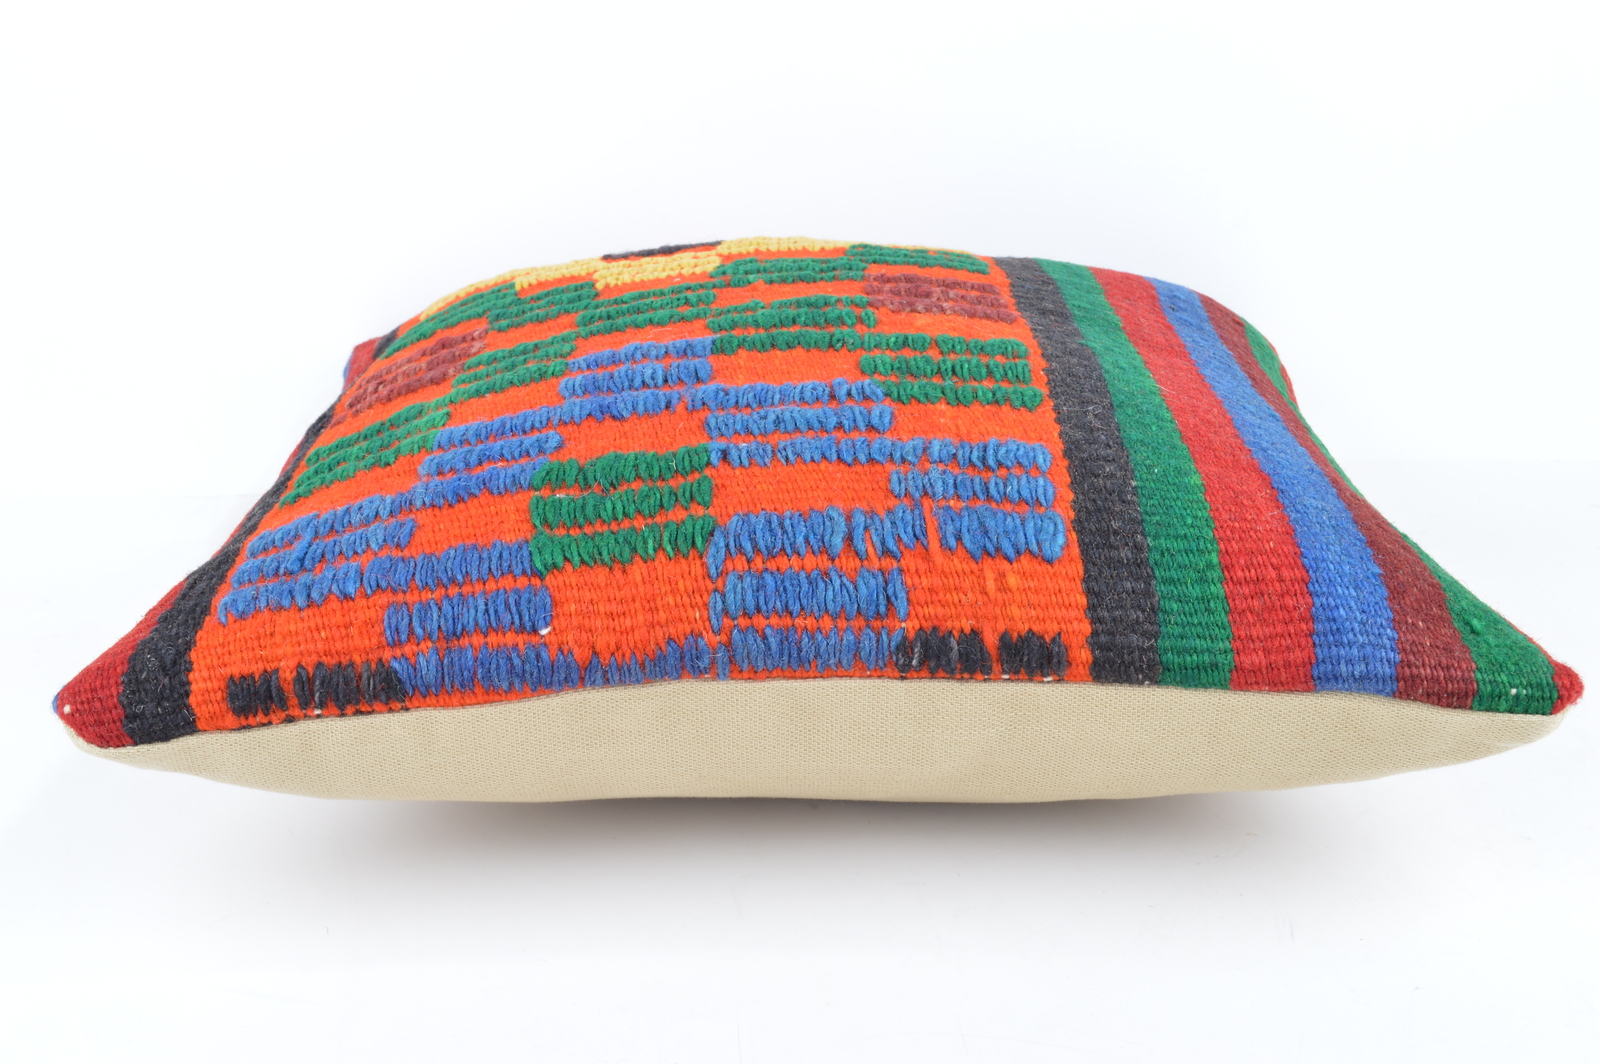 Maia Modern Pillows : Accent embroidered pillows cute pillows modern pillows throw pillow orange green - Pillows